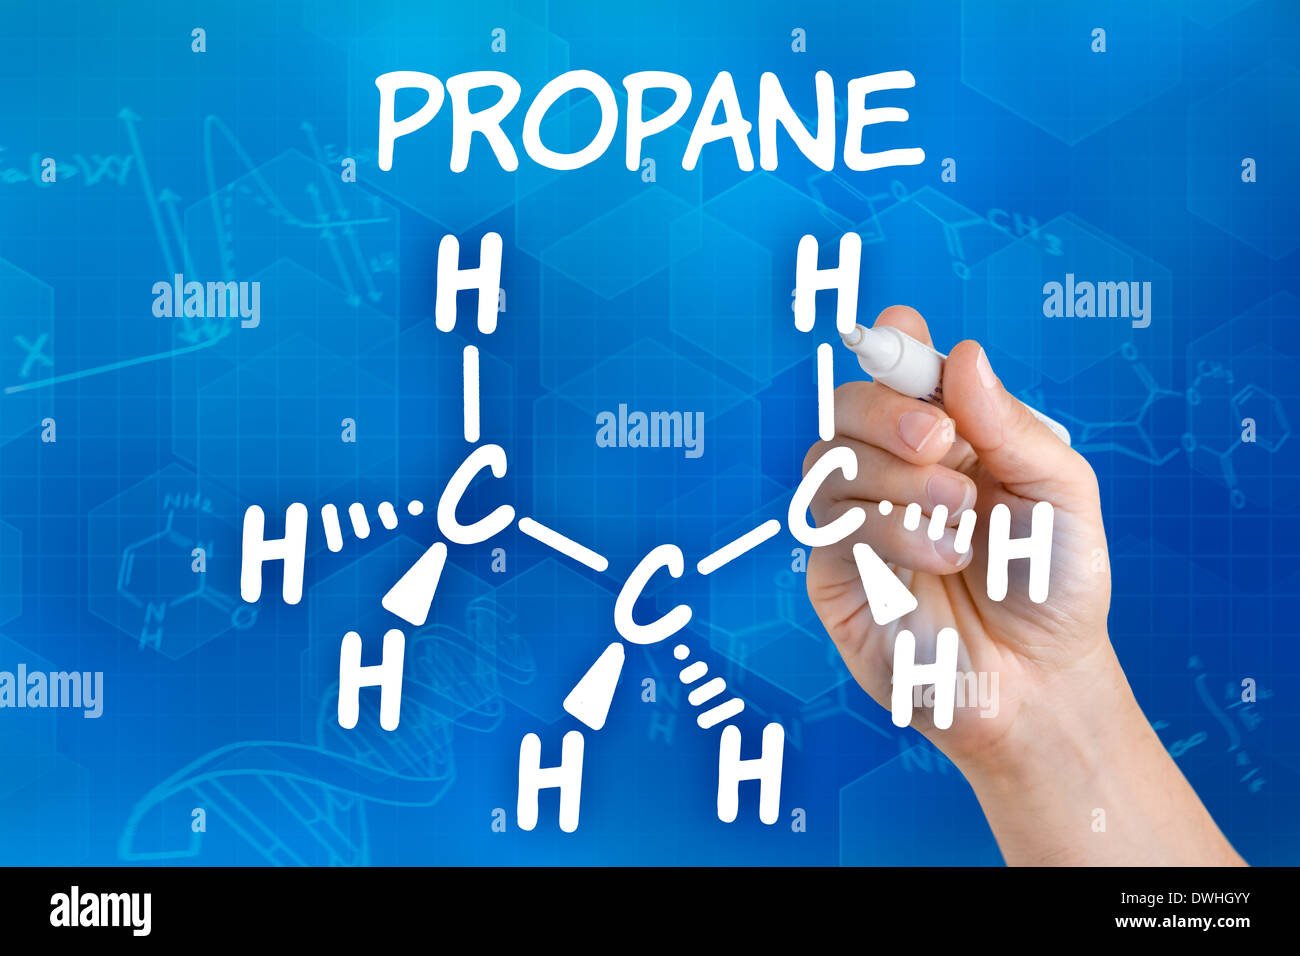 Chemistry Chemical Formula Propane Stock Photos Chemistry Chemical